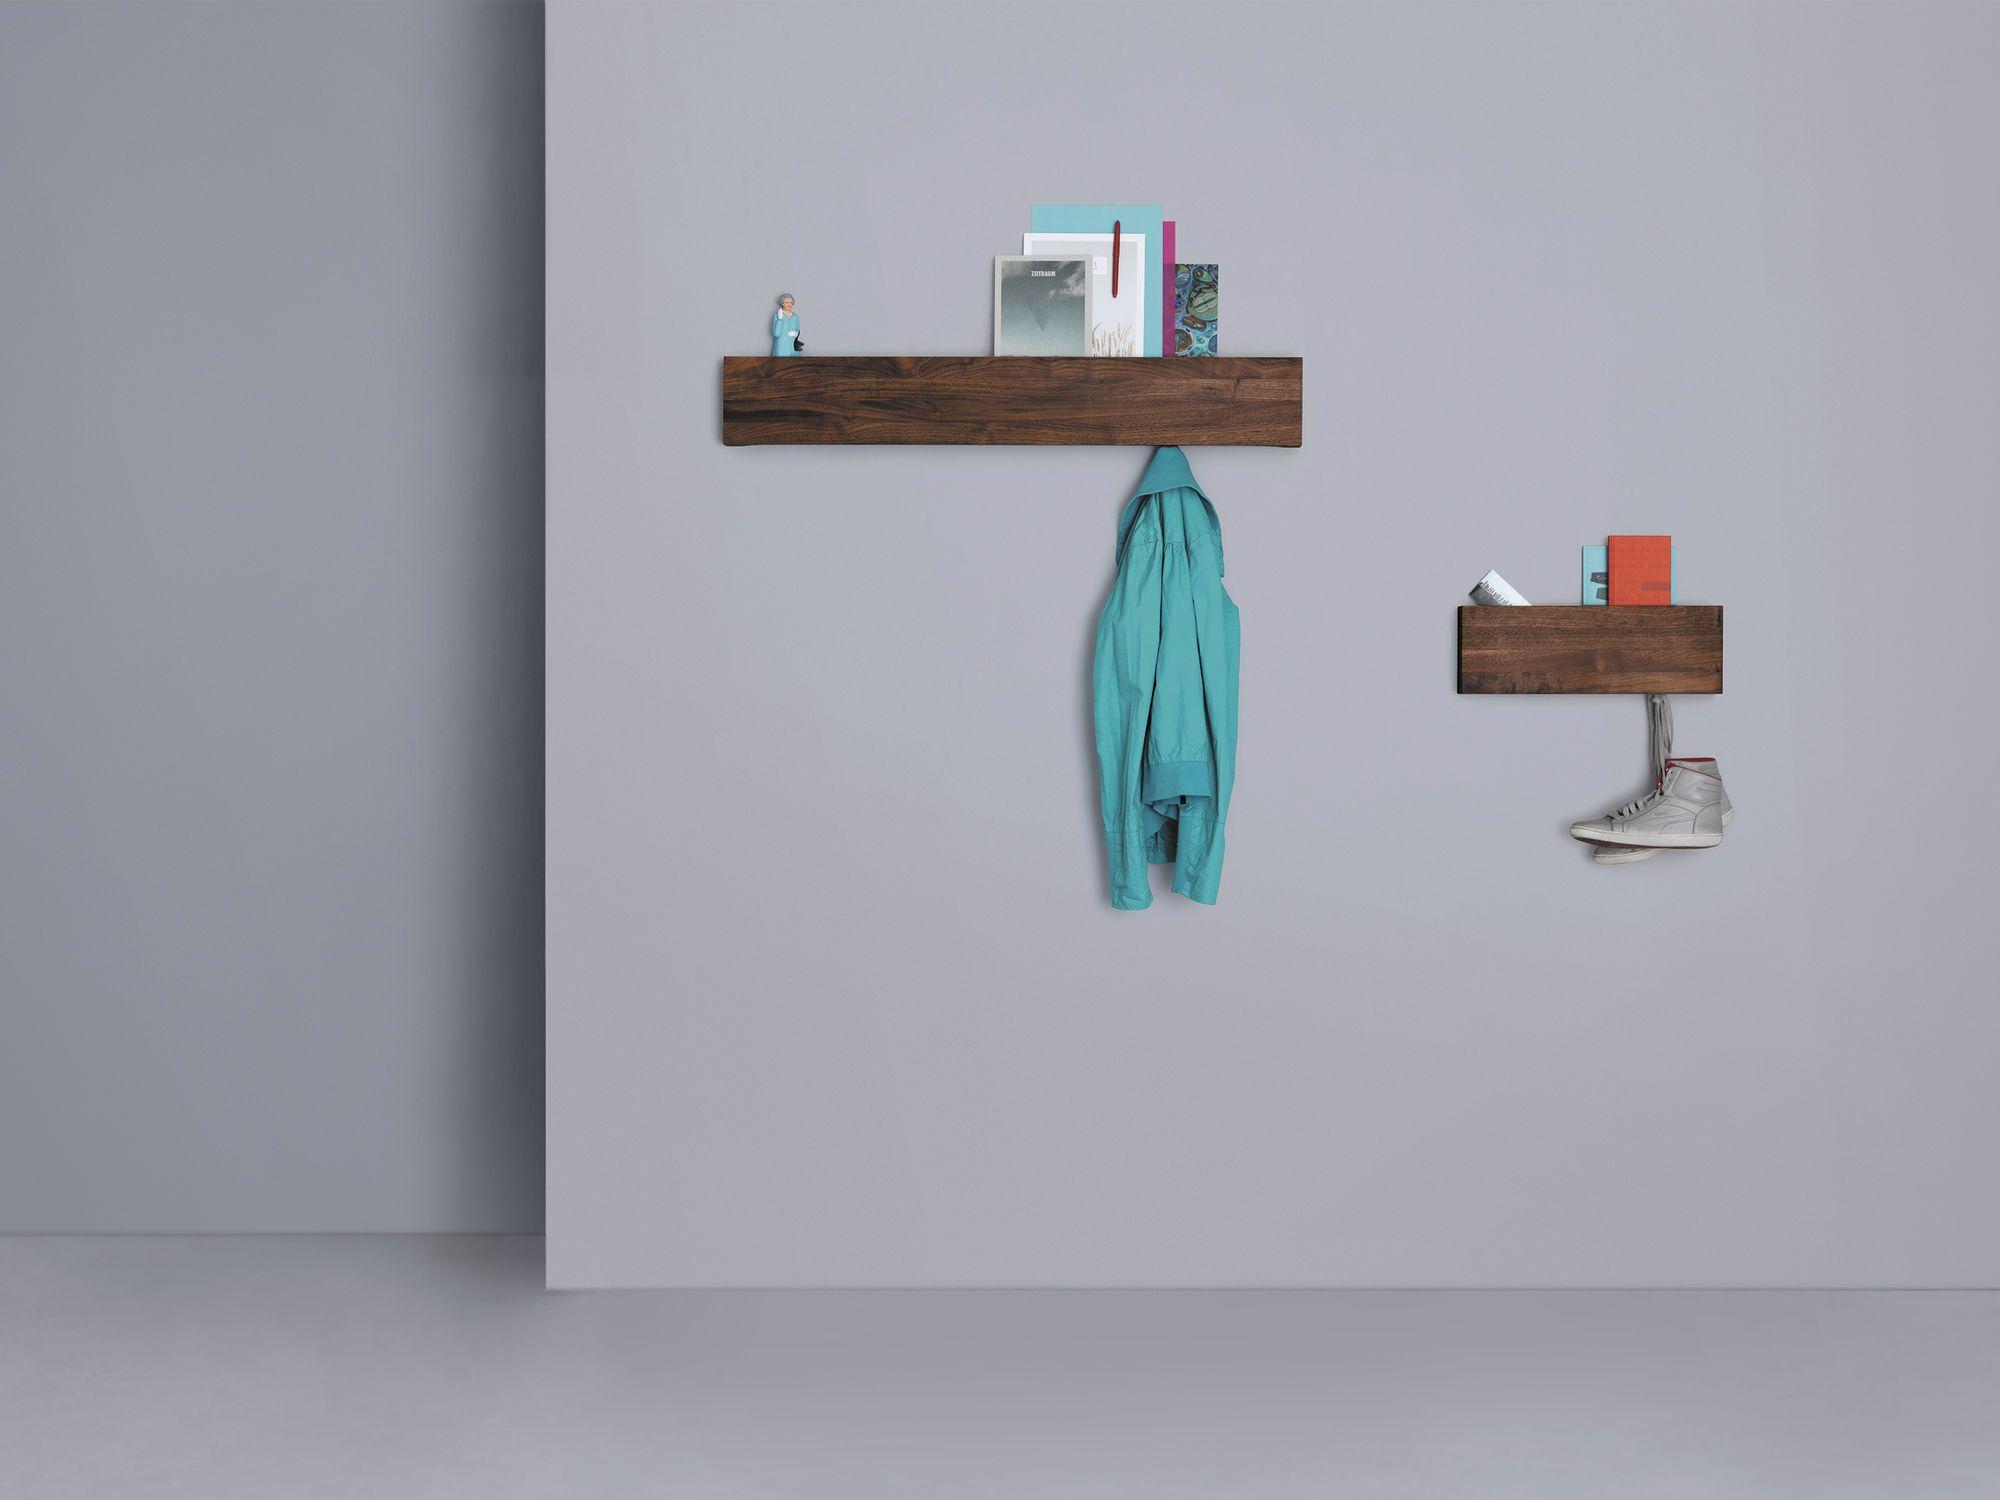 Perchero de pared moderno de madera para uso residencial